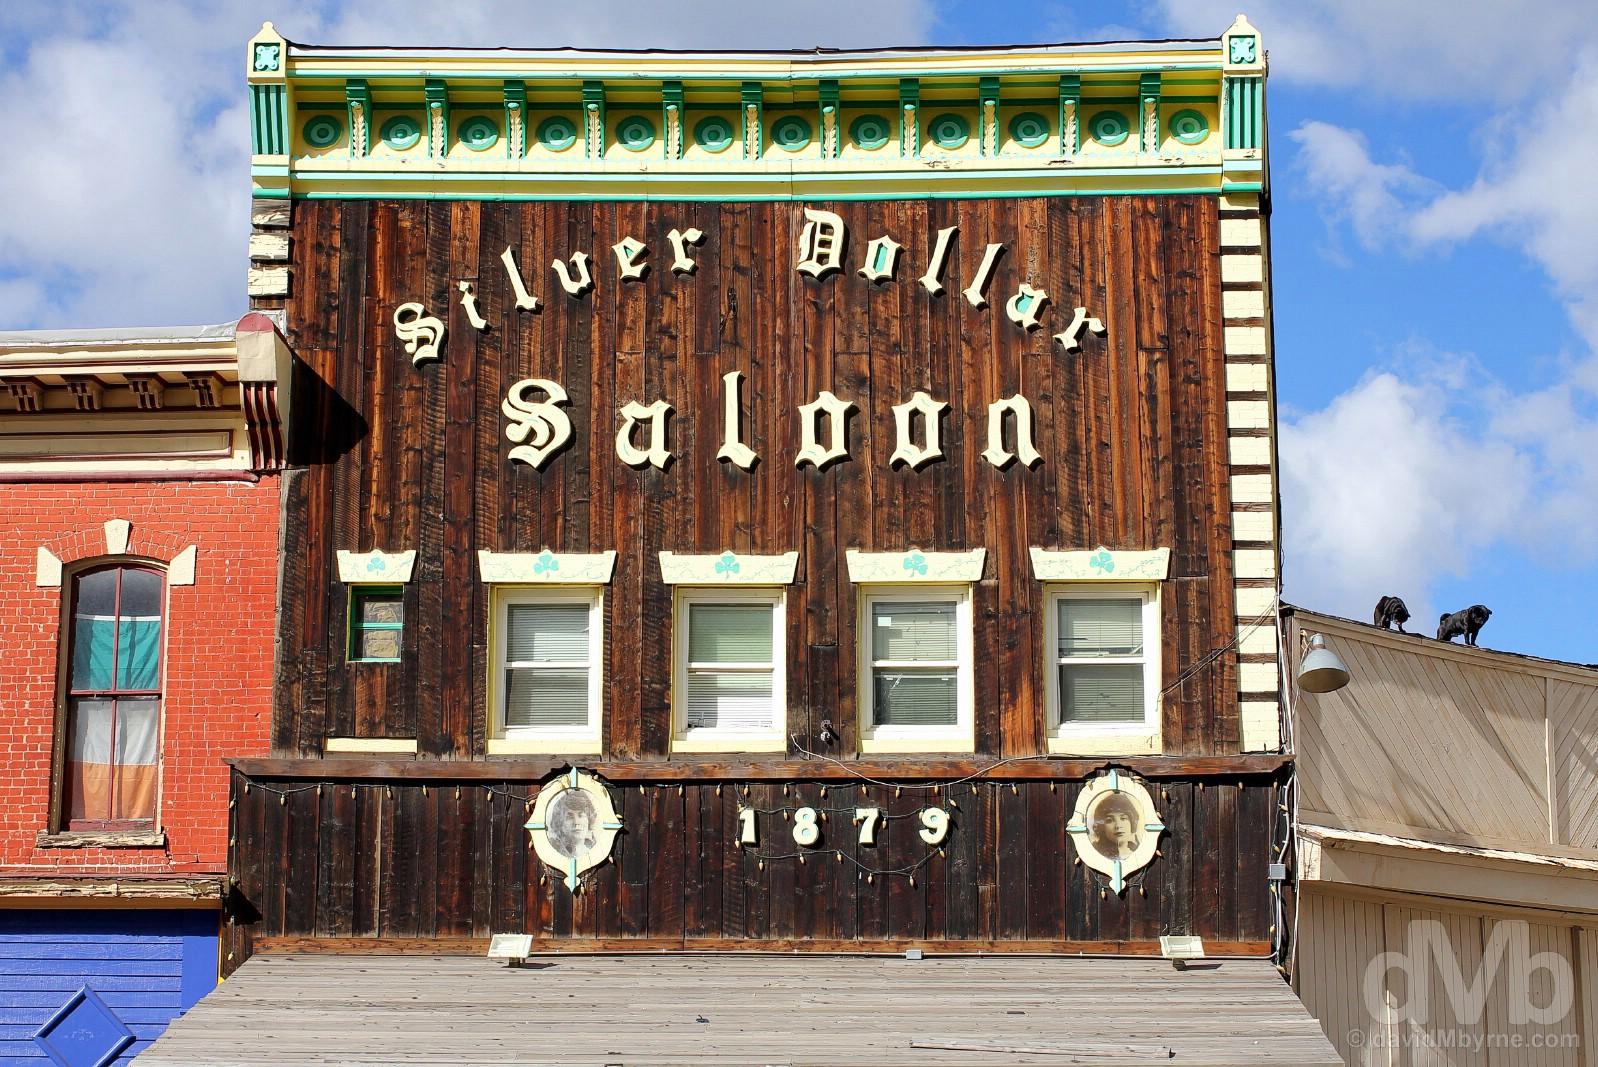 The Silver Dollar Saloon, Harrison Avenue, Leadville, central Colorado, USA. September 13, 2016.